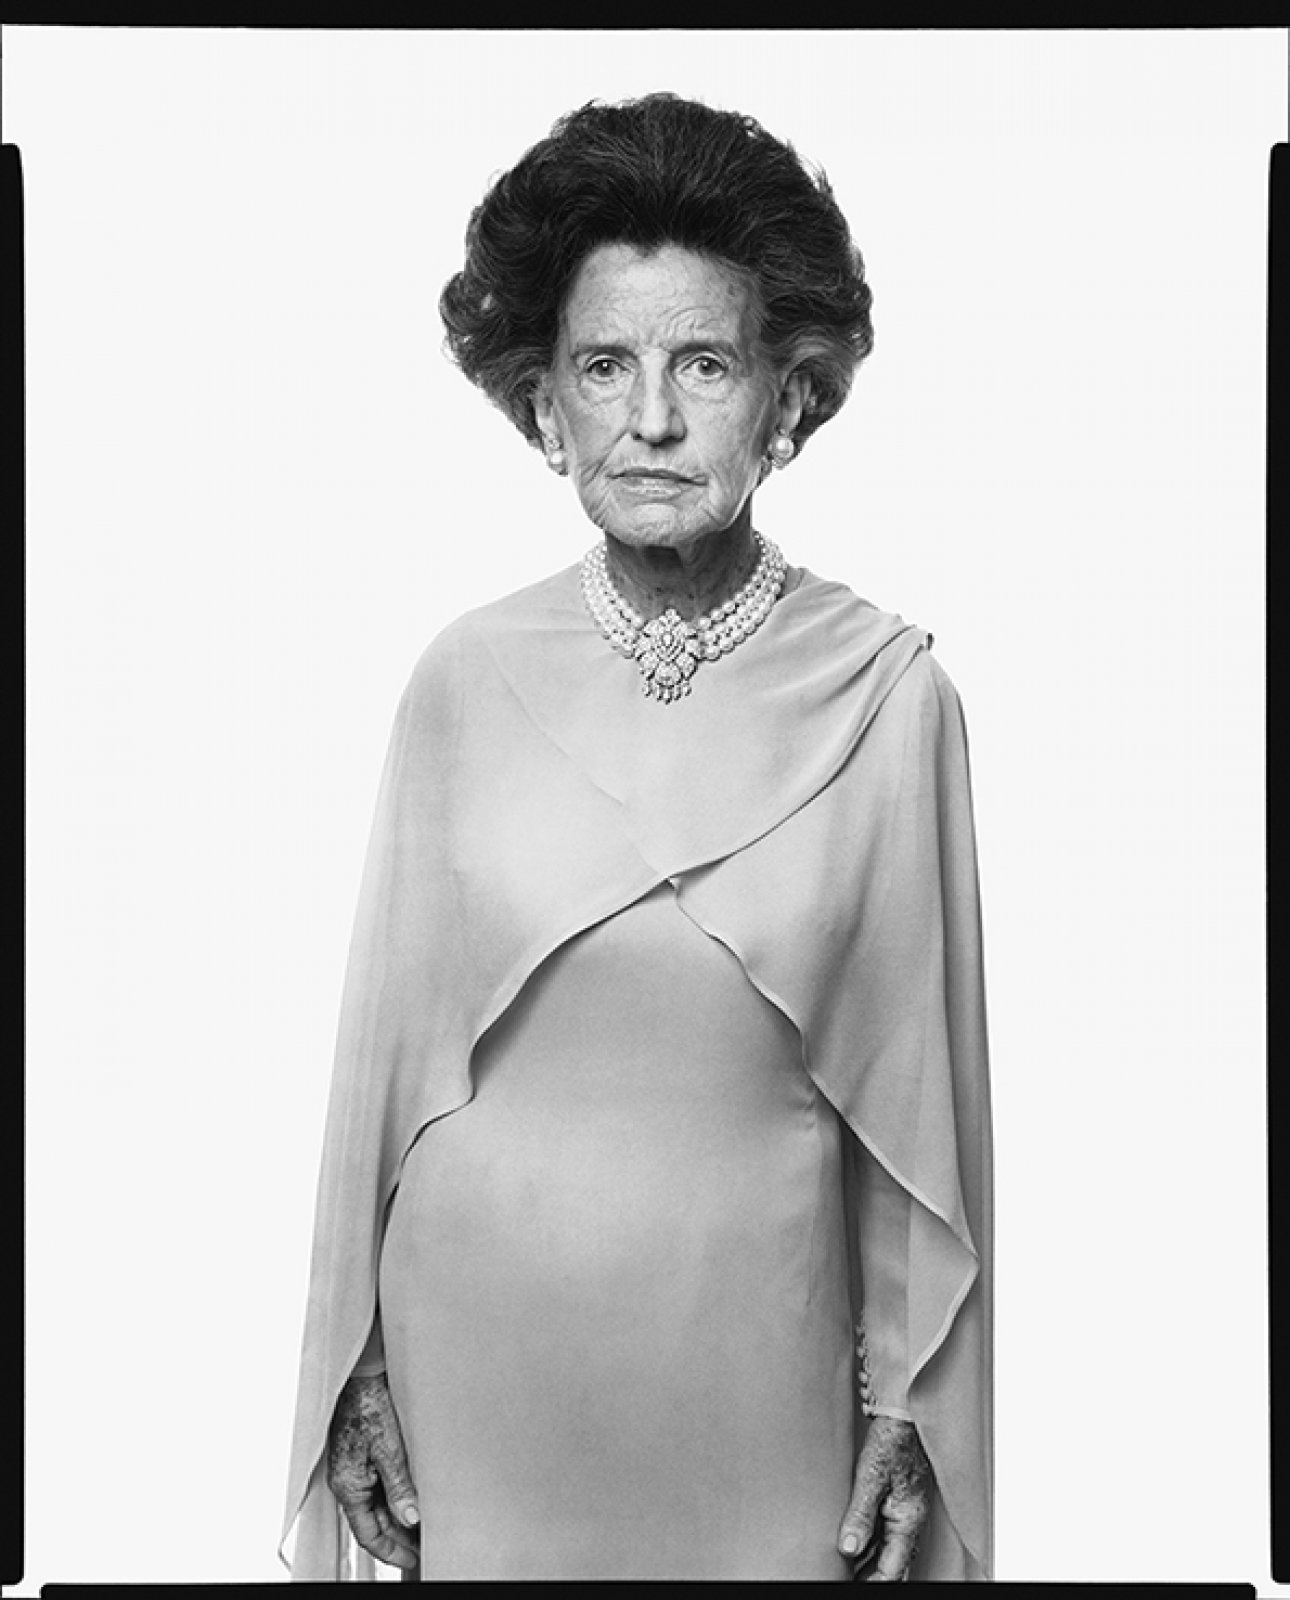 Rose Fitzgerald Kennedy, Hyannisport, Massachusetts, September 2, 1976  Photograph by Richard Avedon Copyright © The Richard Avedon Foundation